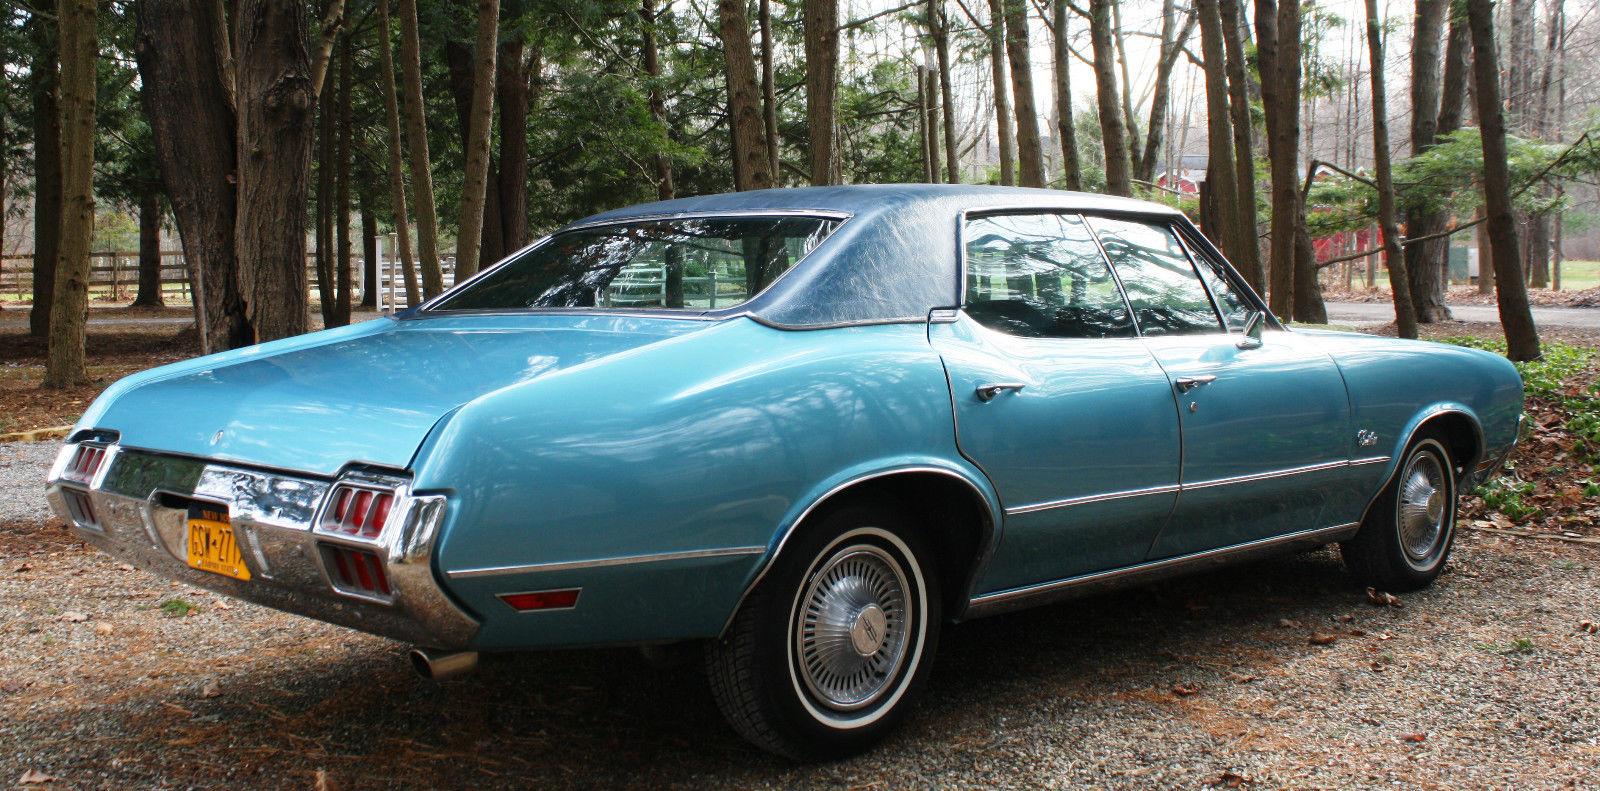 1970 Plymouth Barracuda Wiring Diagram Custom Project Roadrunner Harness 1966 Dodge Coro Engine 1978 Cuda